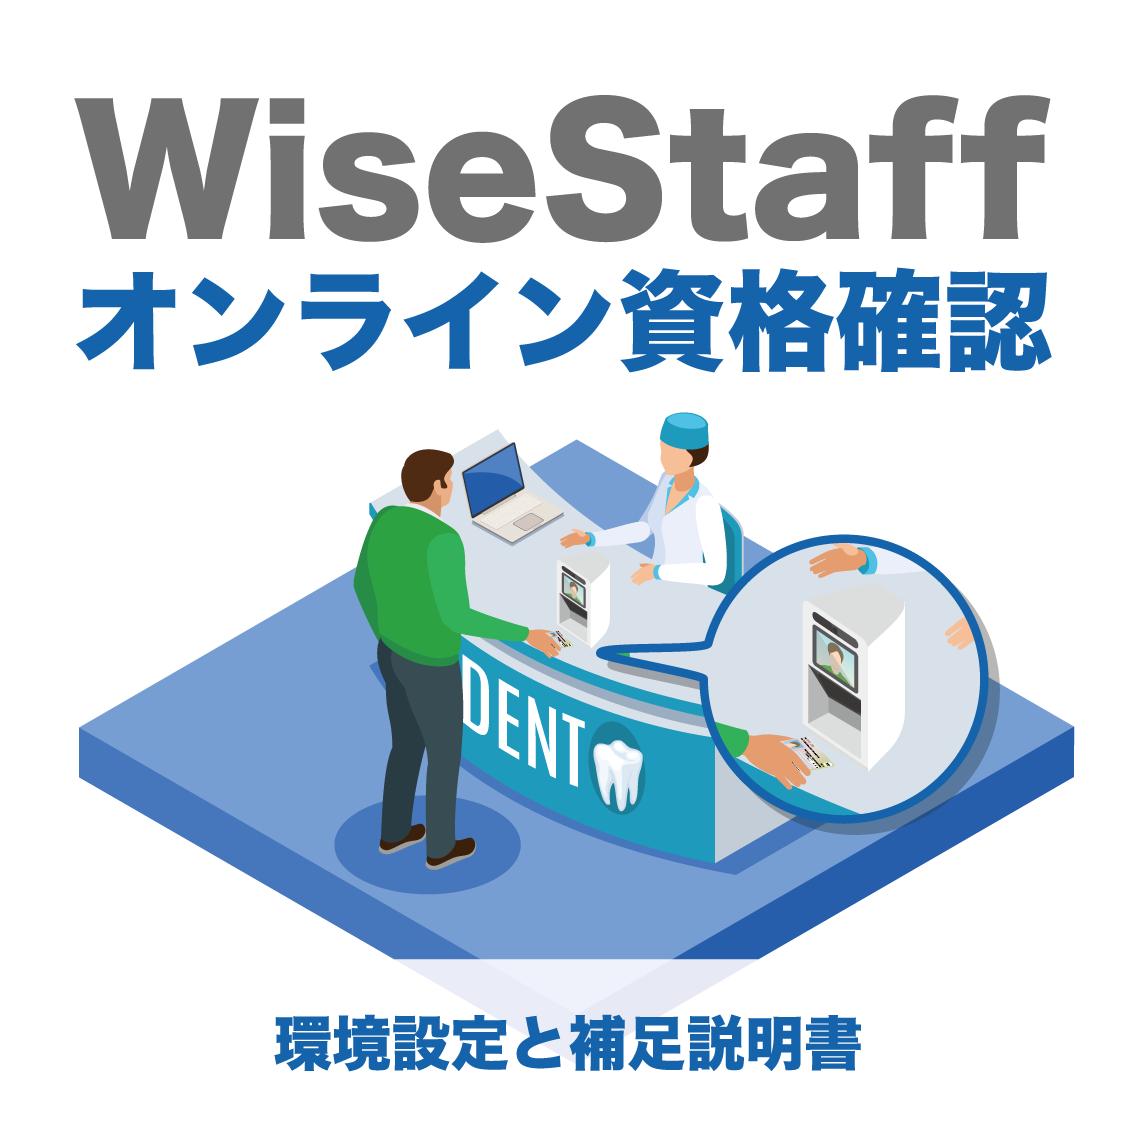 WiseStaff オンライン資格確認